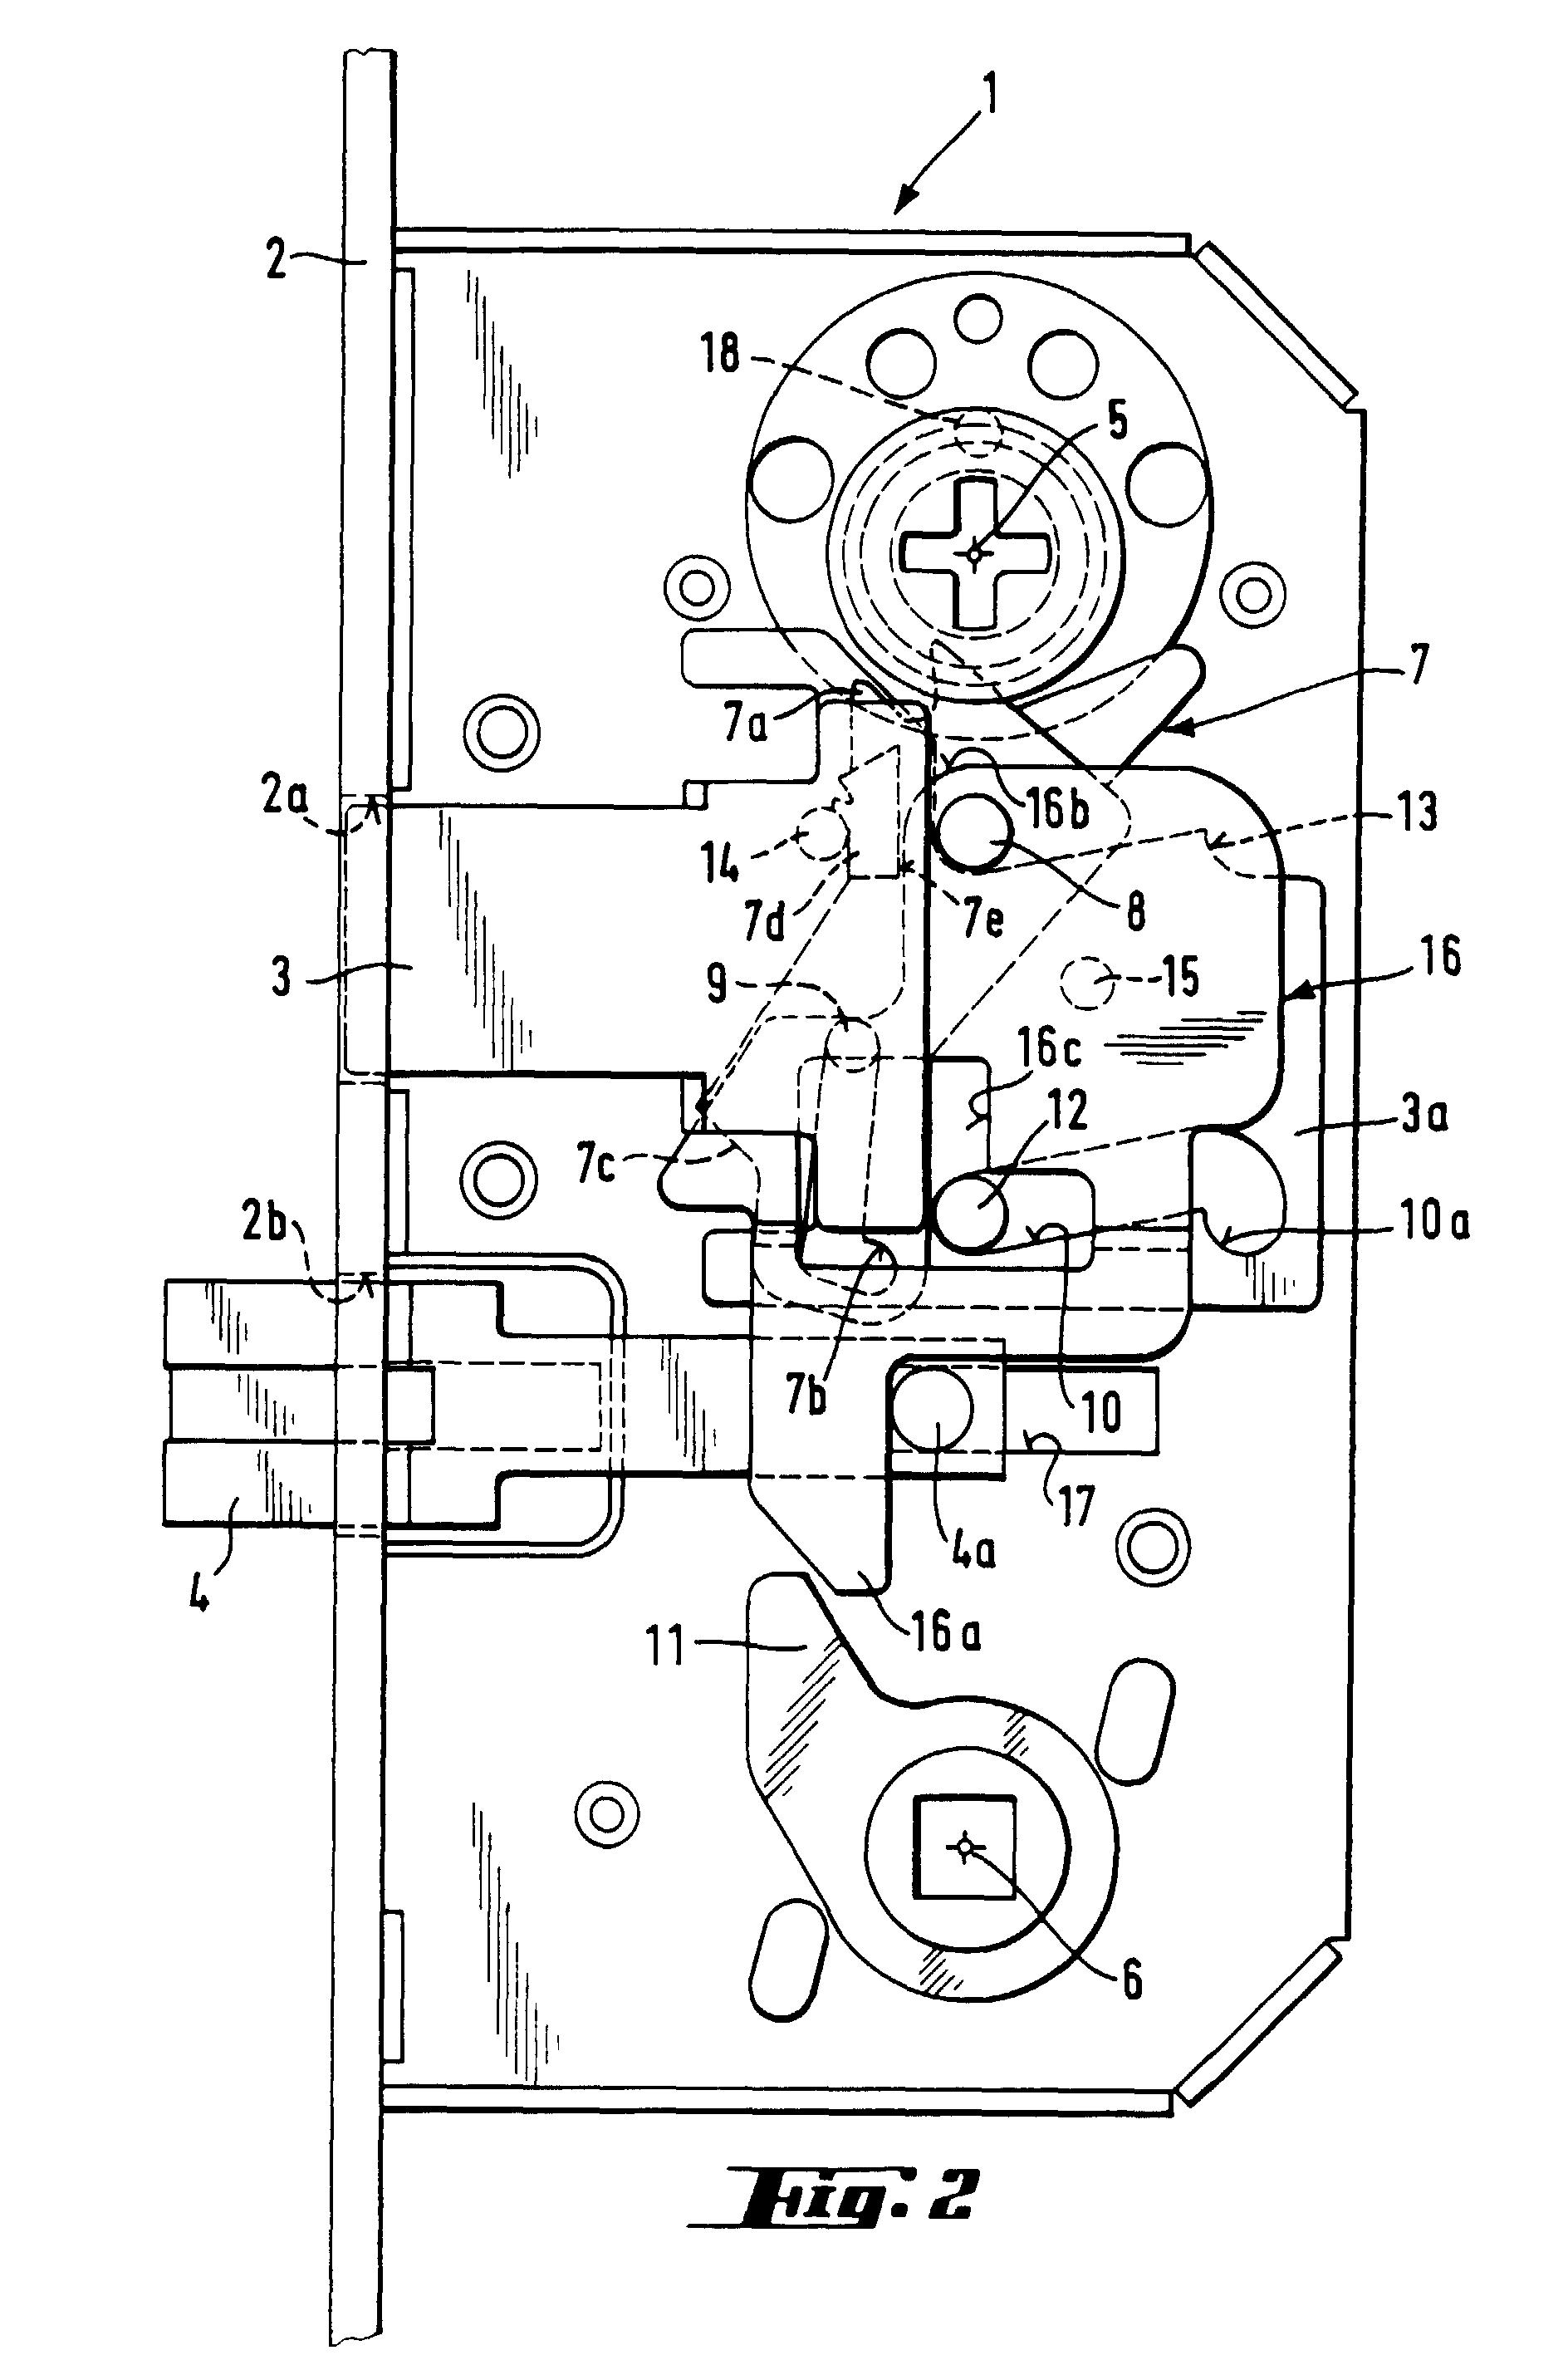 Patent Ep0668424b1 Serrure D Une Porte 224 Clenche